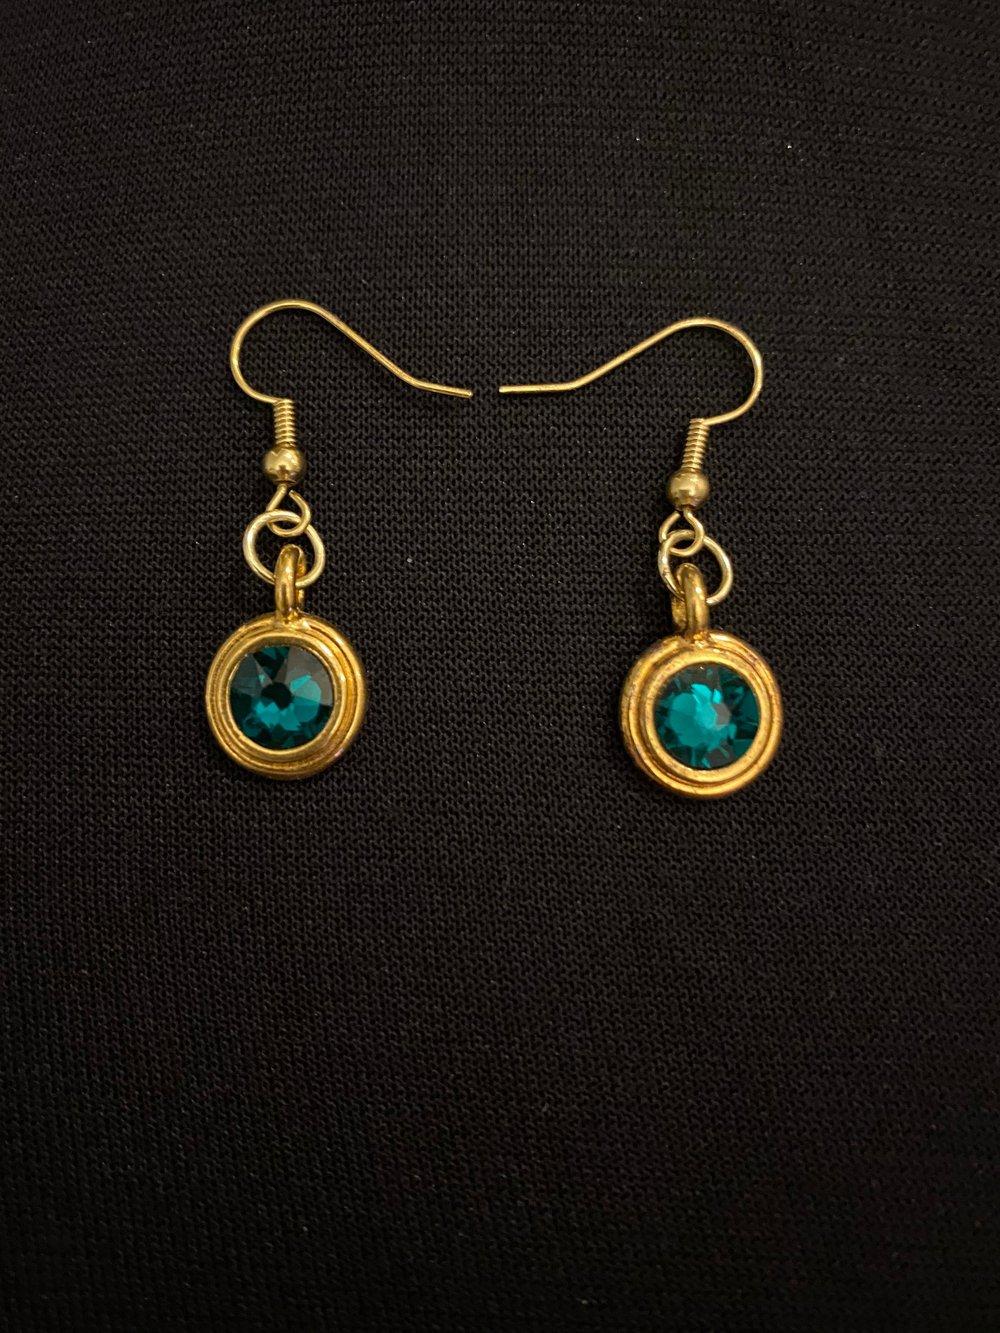 Emerald Glass Pendant Gold Earrings